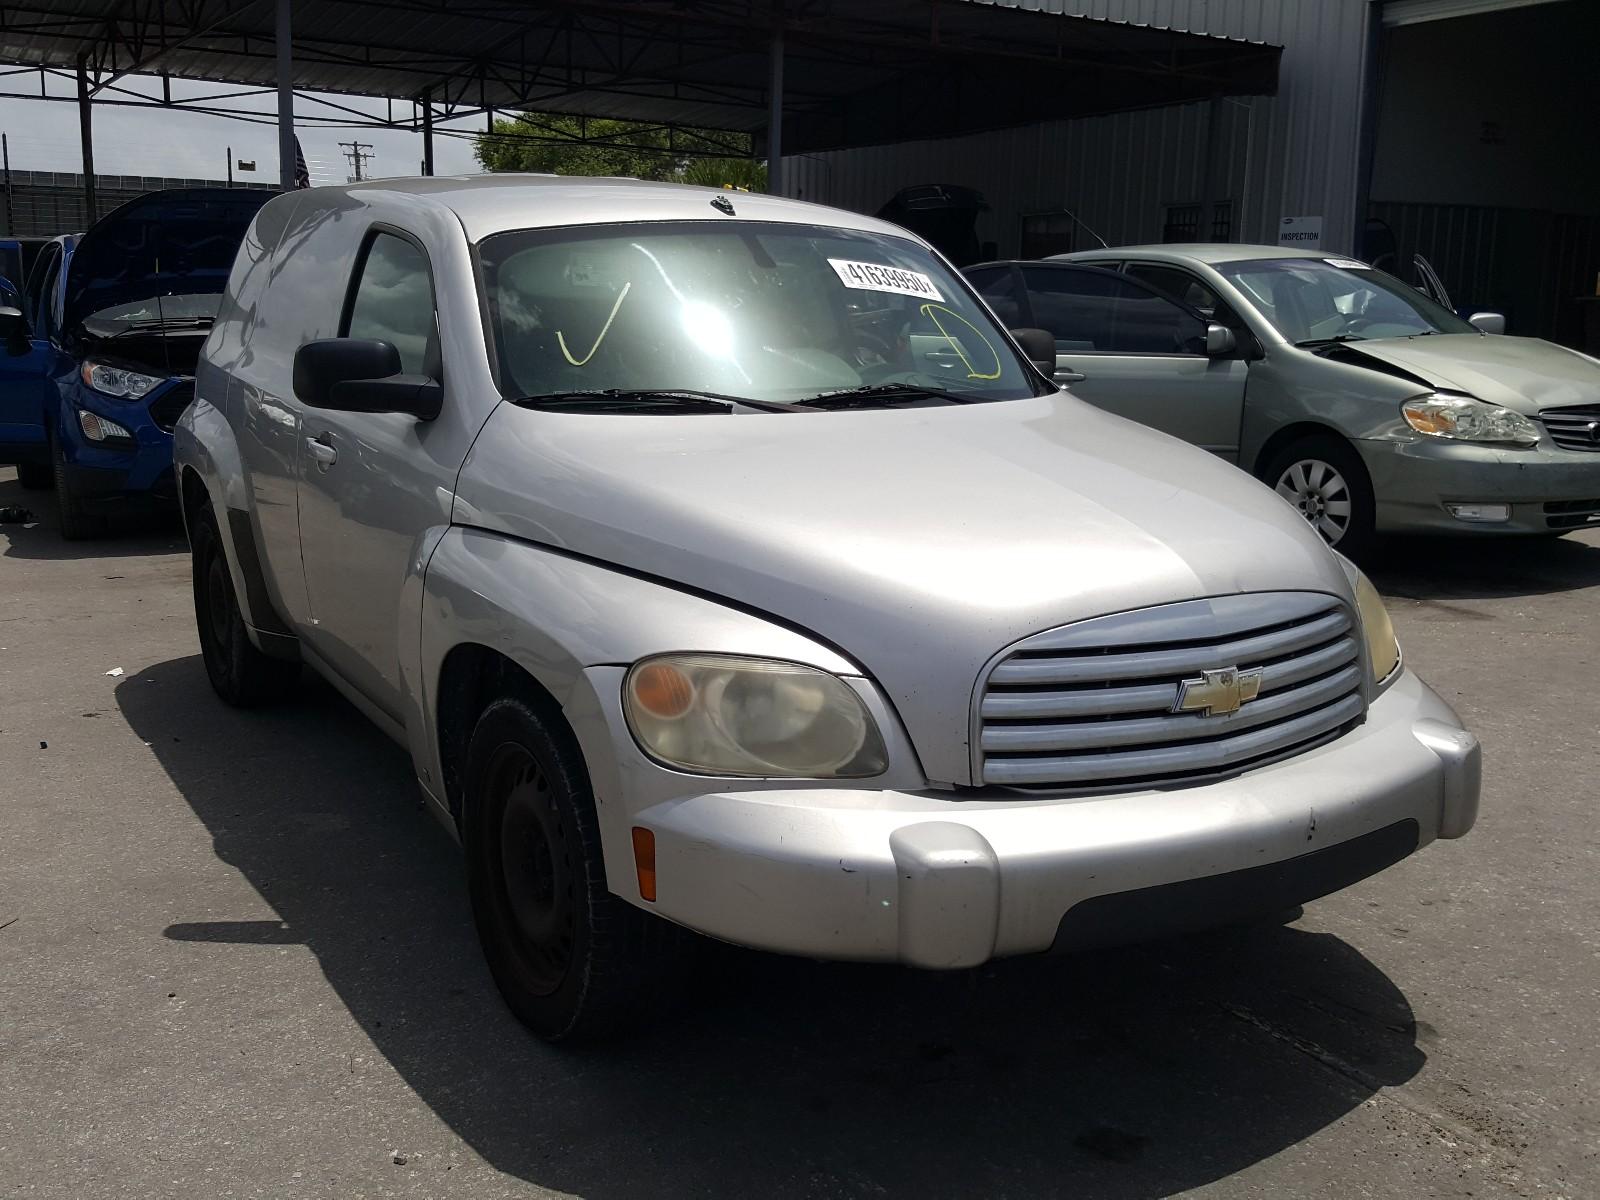 2008 Chevrolet Hhr Panel For Sale At Copart Orlando Fl Lot